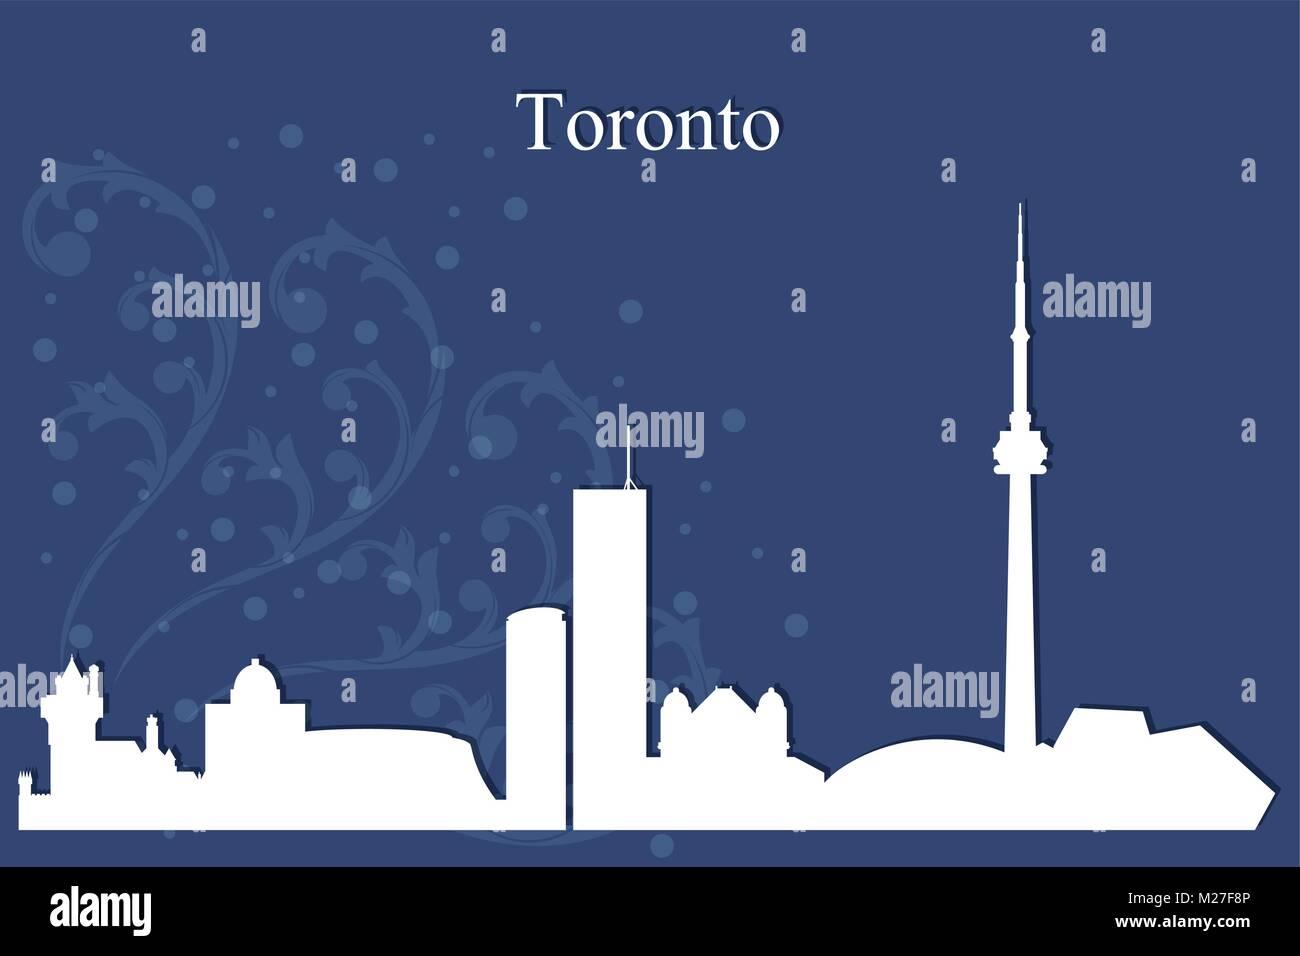 Toronto city skyline silhouette on blue background, vector illustration - Stock Vector